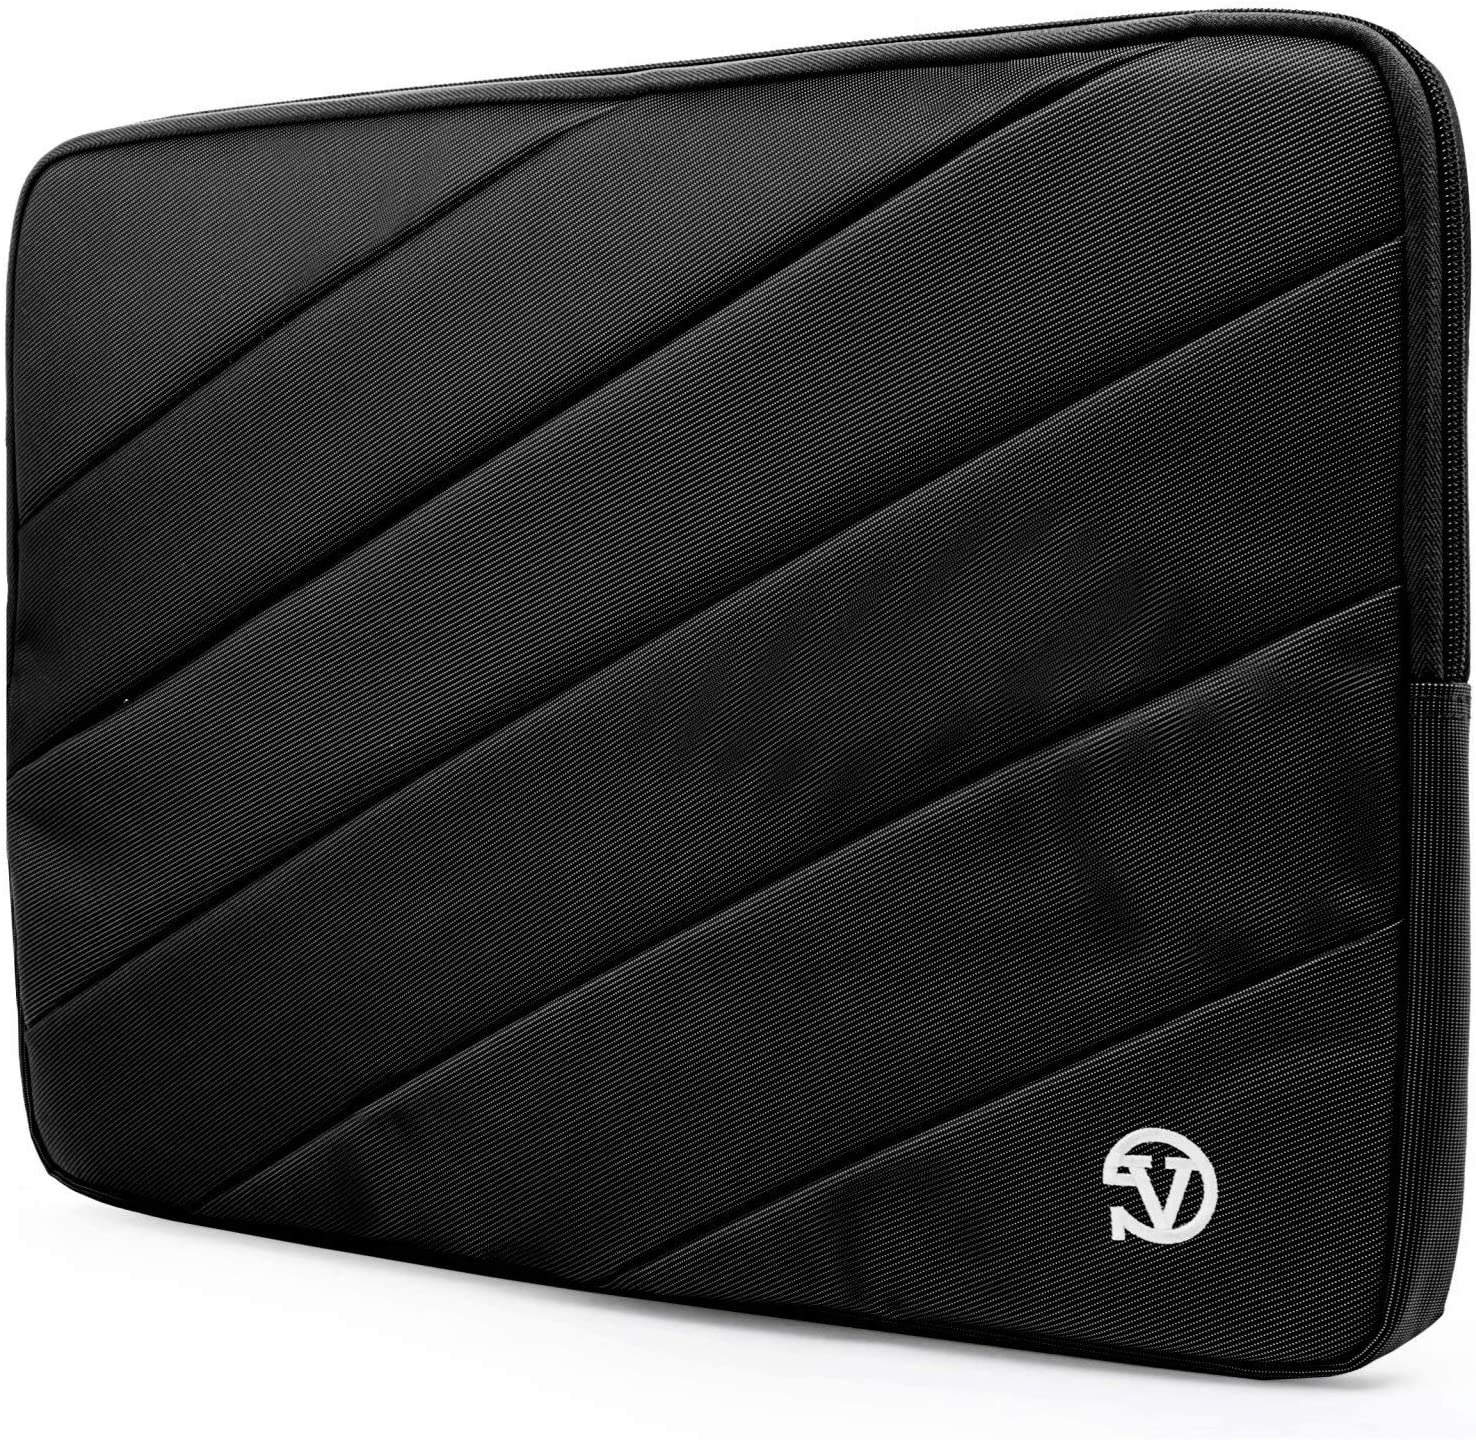 Multicolor Laptop Tablet Sleeve Case 13 Inch for Lenovo ThinkPad 11e Series, Yoga C Series, ideapad 300, ThinkBook, Miix, Black